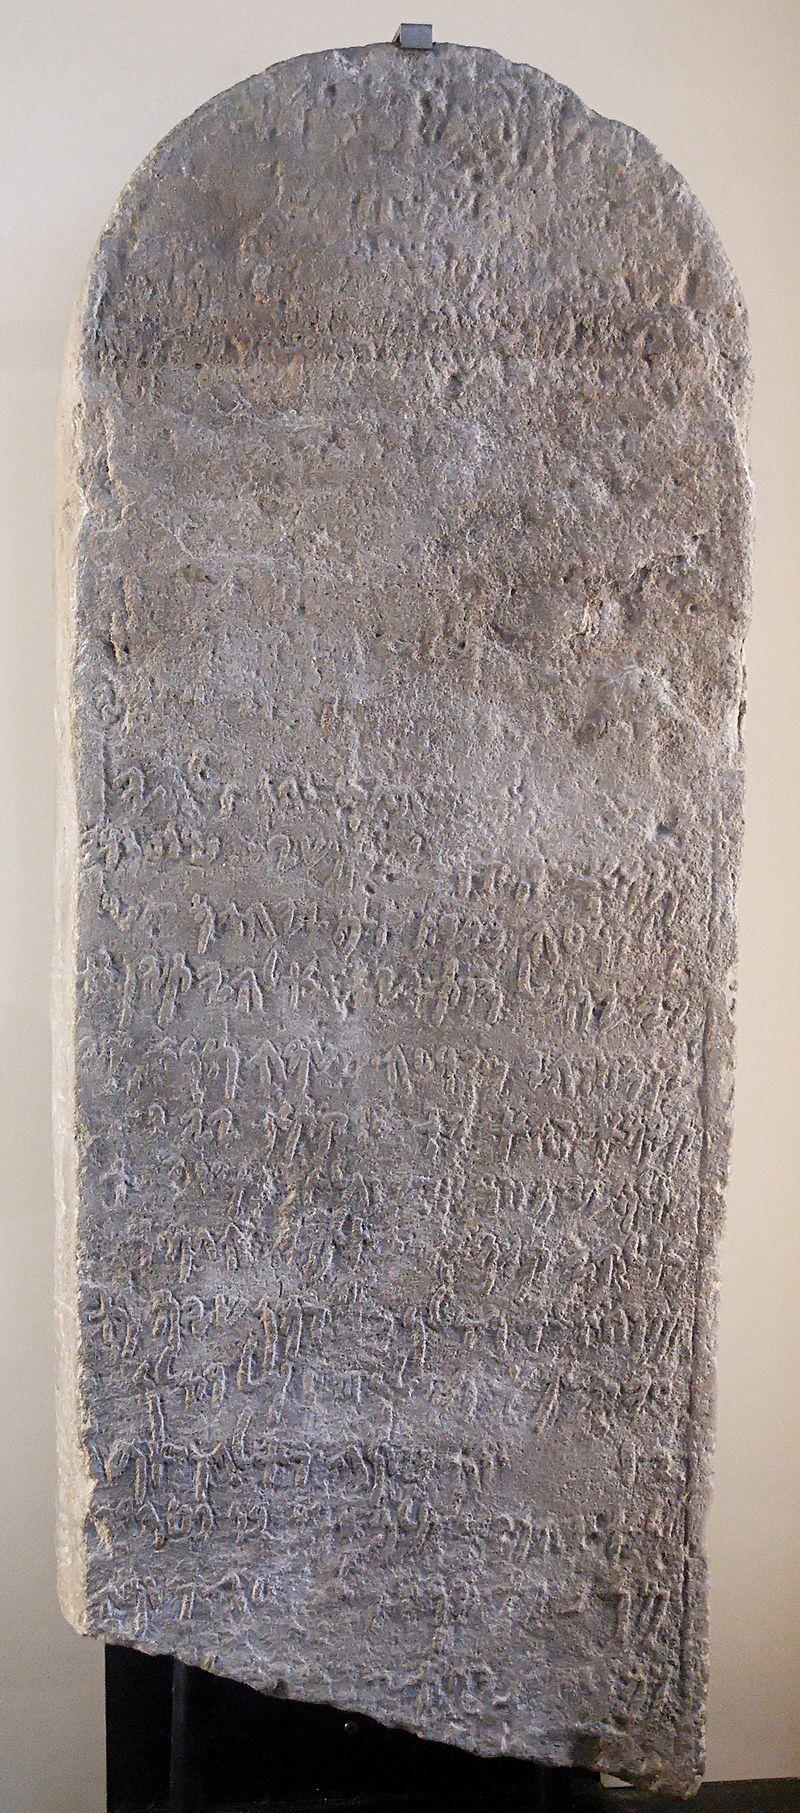 Teima stone Louvre AO1505.jpg